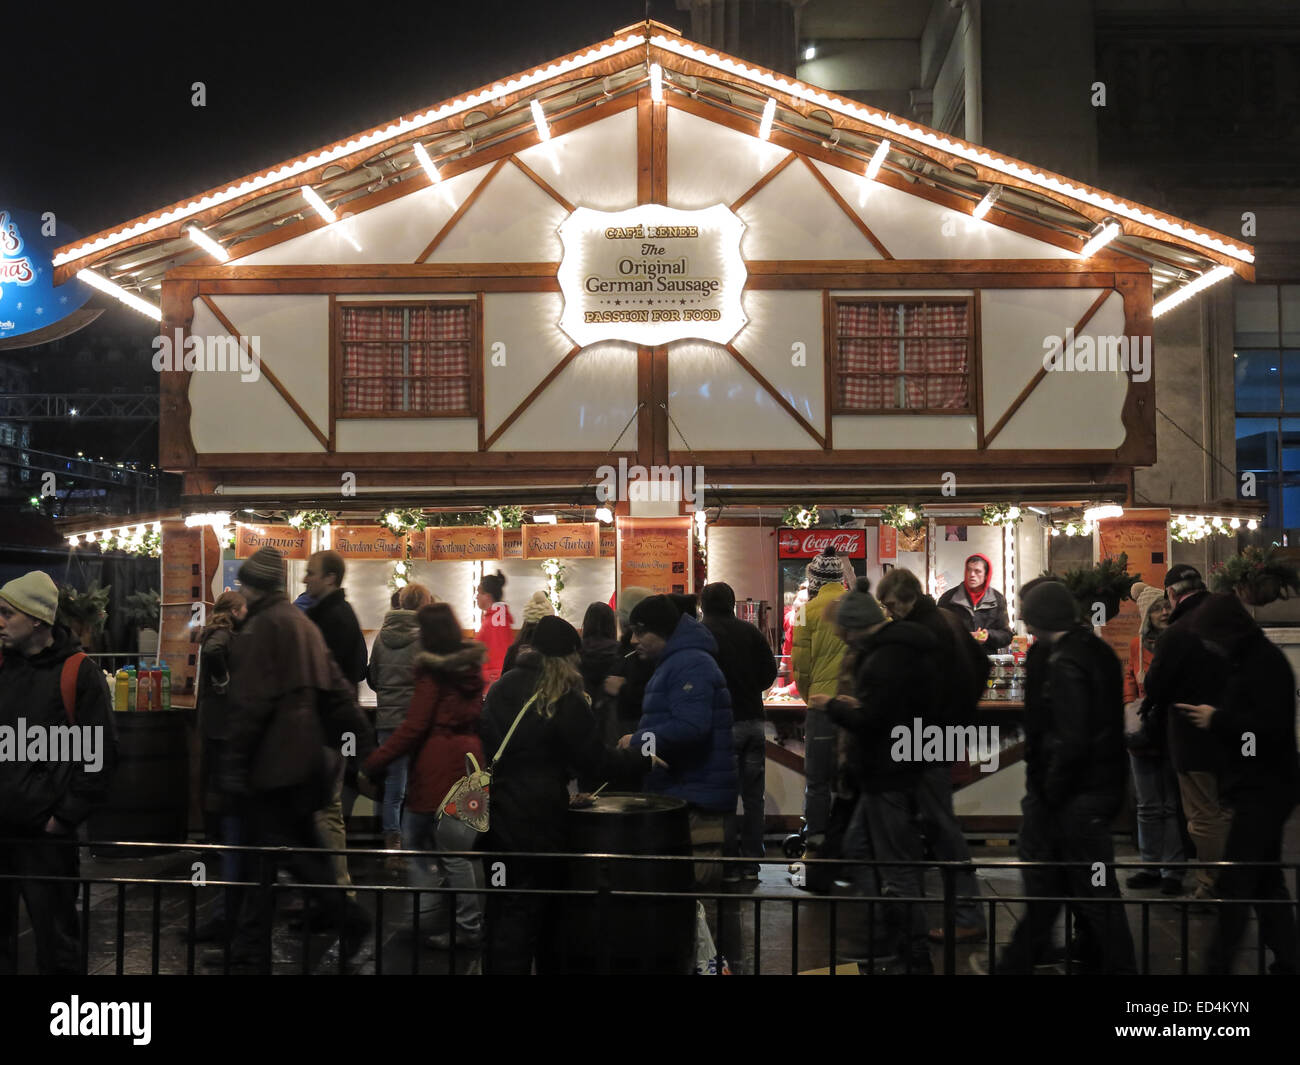 Princes St,Princes,St,Street,night,dusk,people,crowd,crowds,queue,Christmas,Edinburgh,Xmas,Cafe Renee,German,Sausage,House,stall,cafe,Renee,festive,market,markets,Gotonysmith